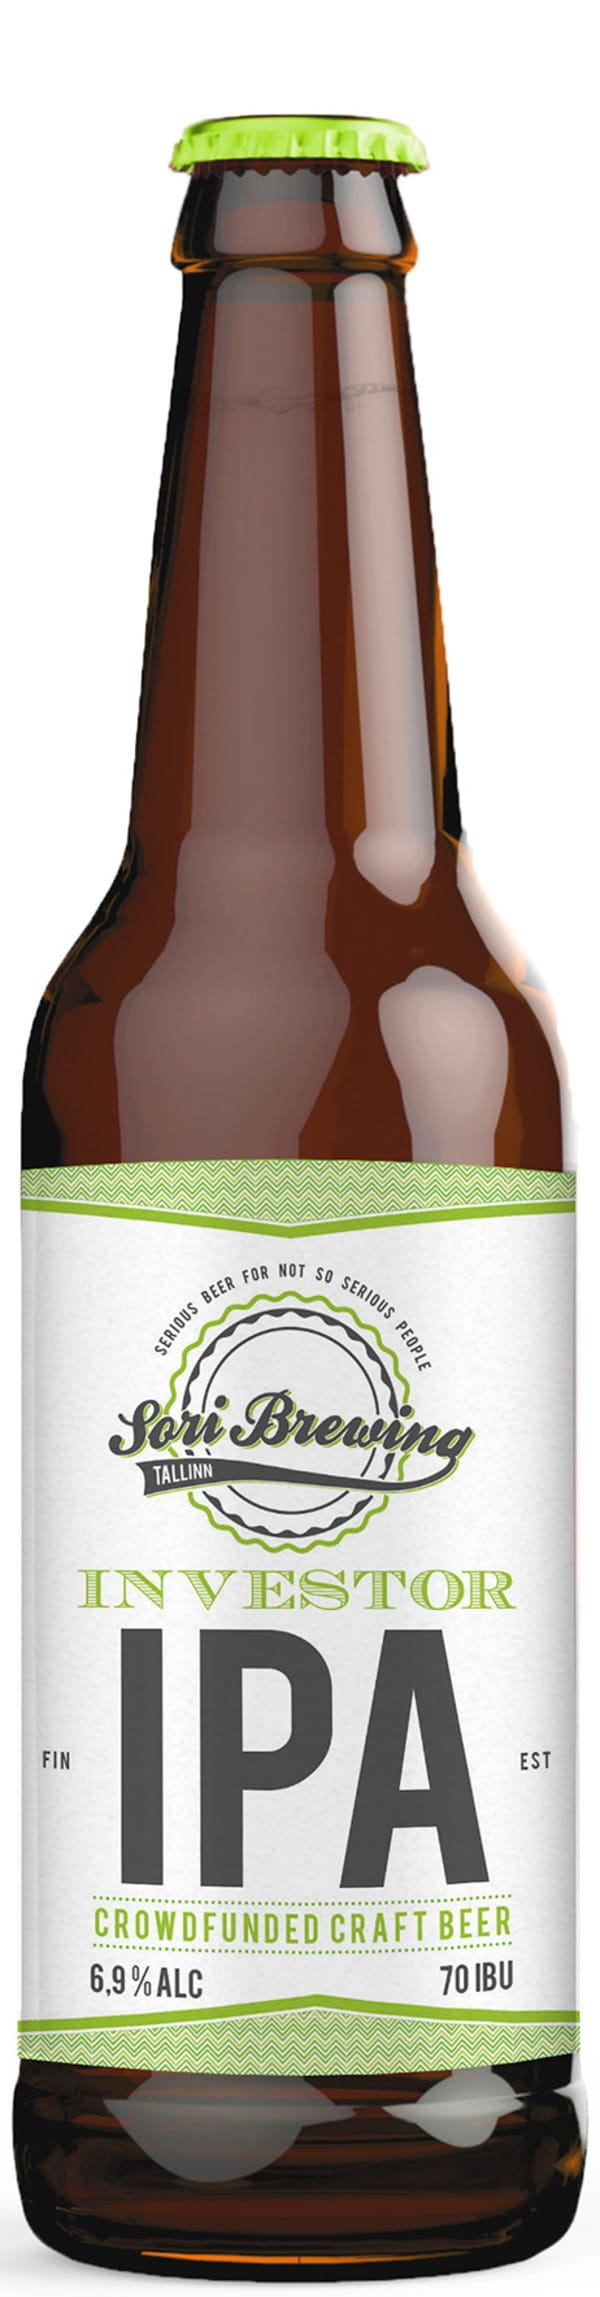 Sori Brewing Investor IPA